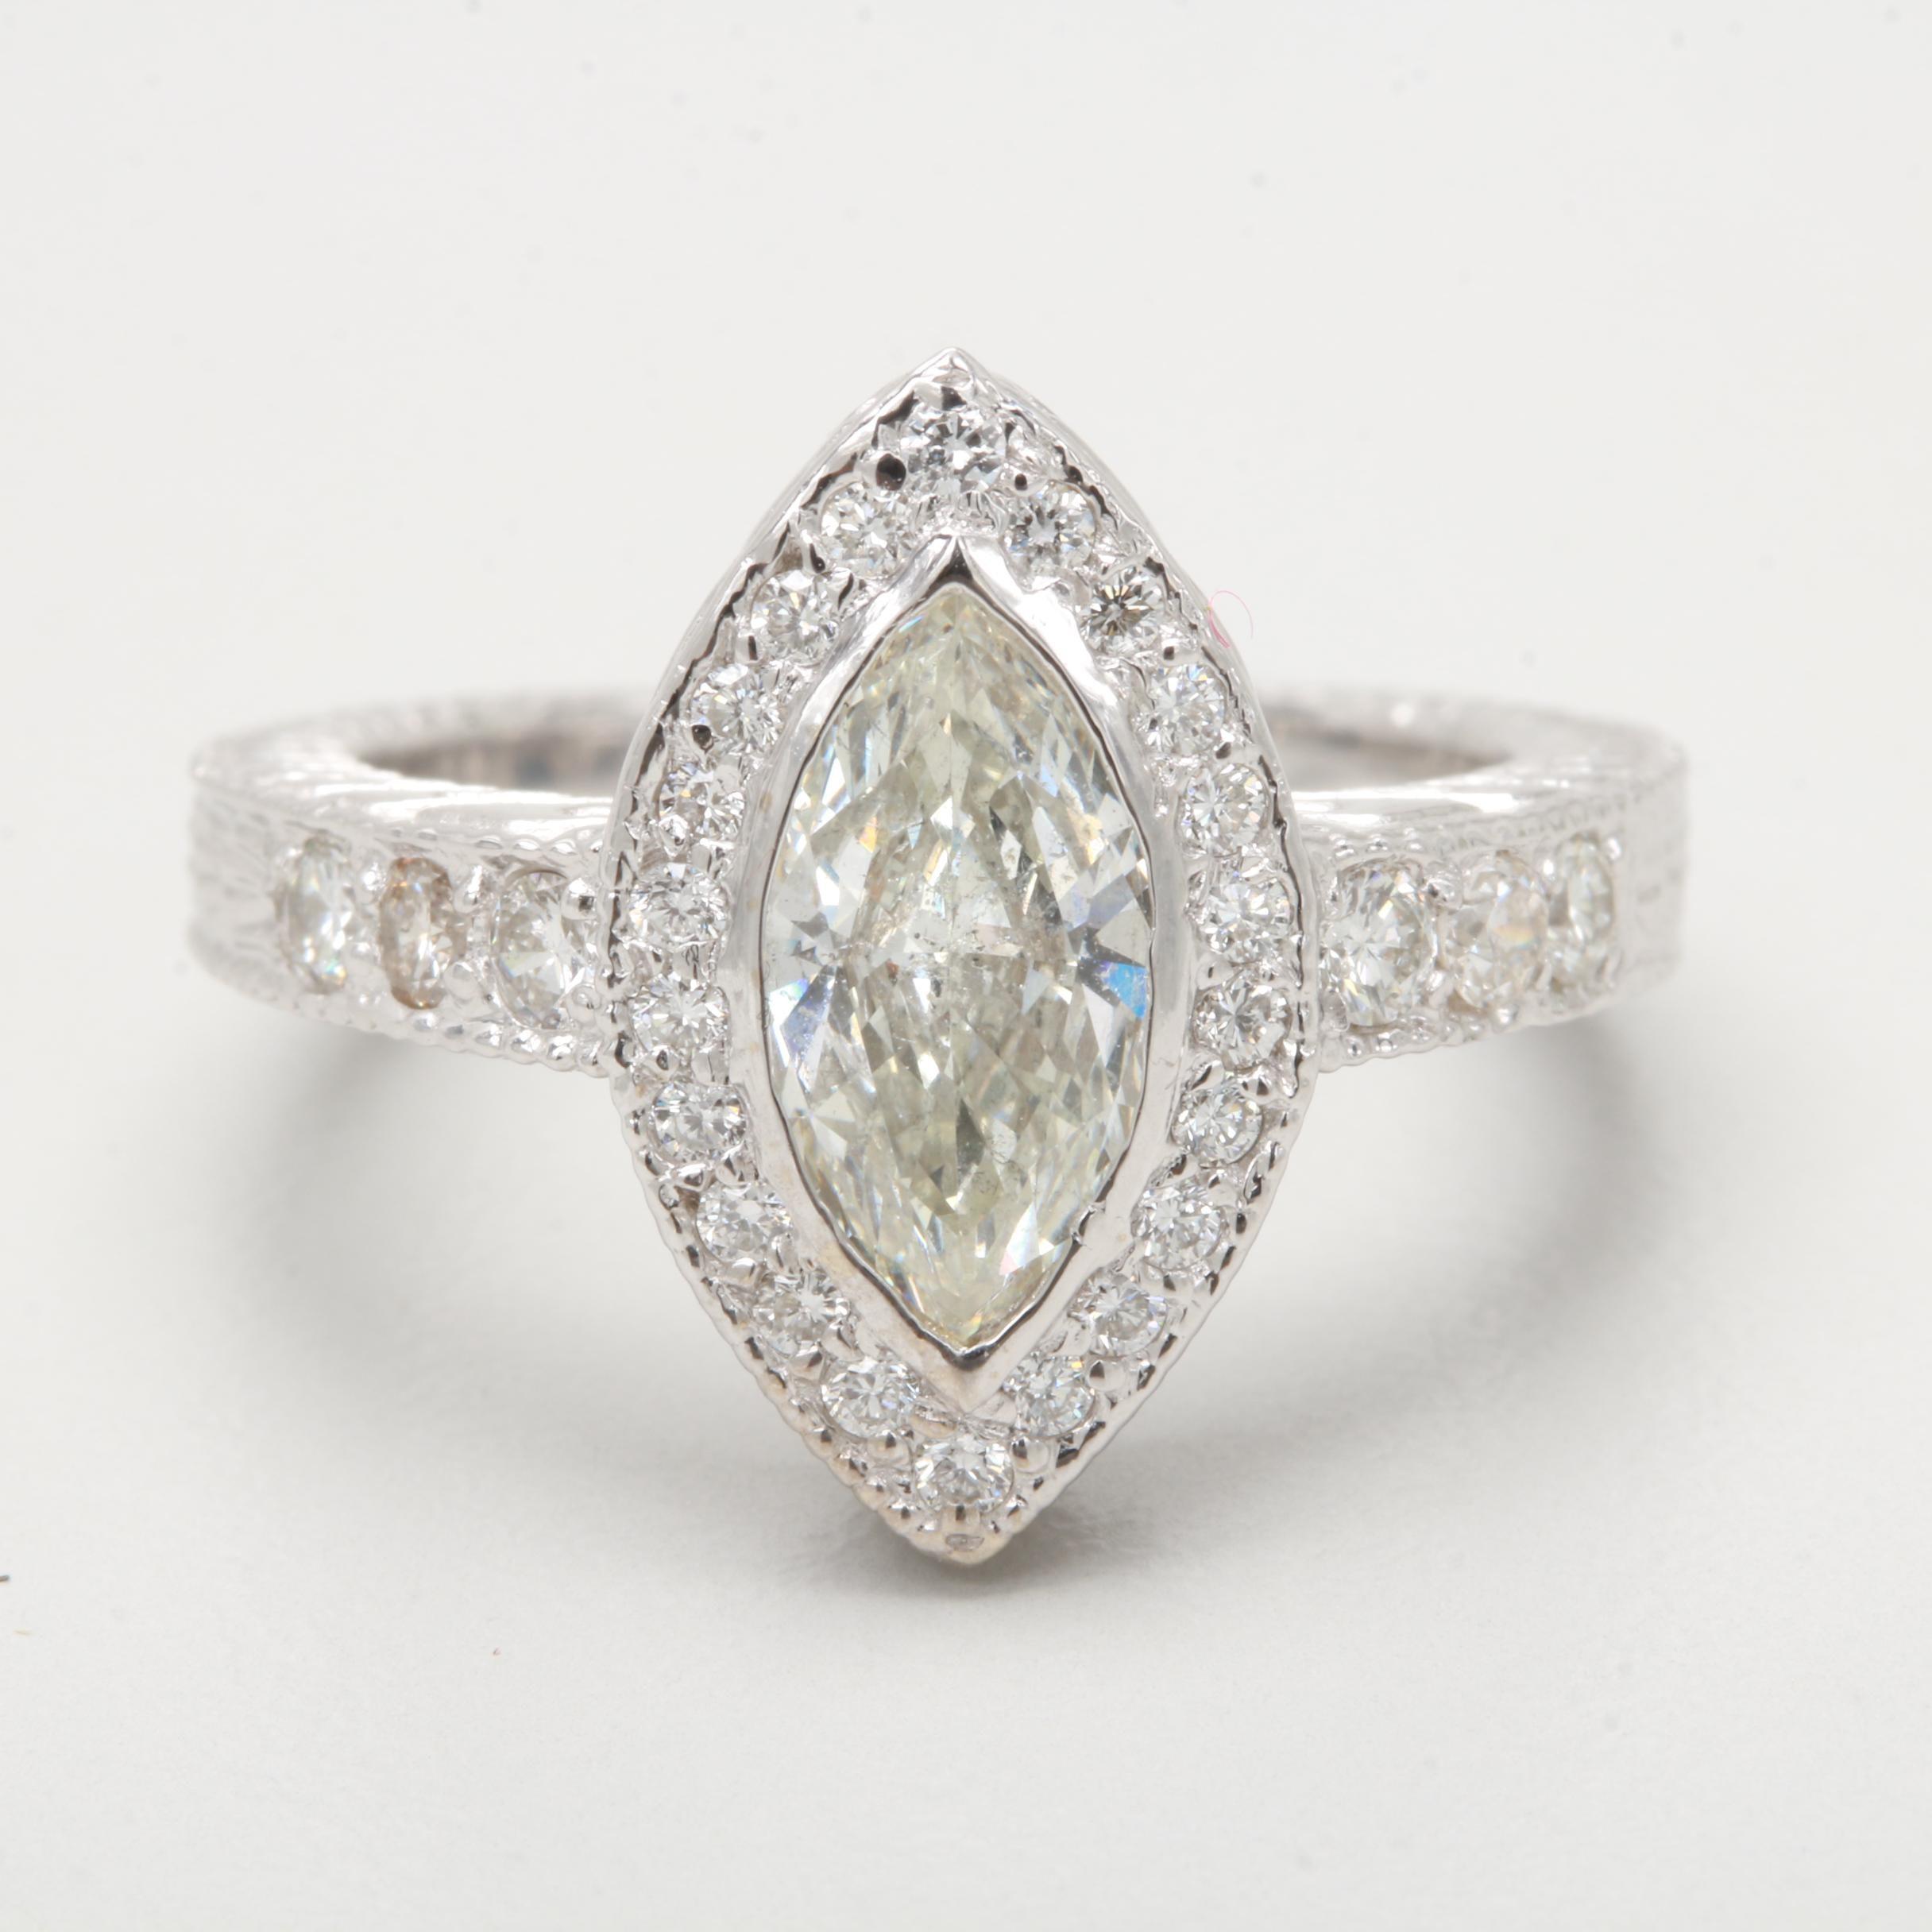 14K White Gold 1.00 CT Marquise Center Diamond Ring with GIA Diamond Dossier